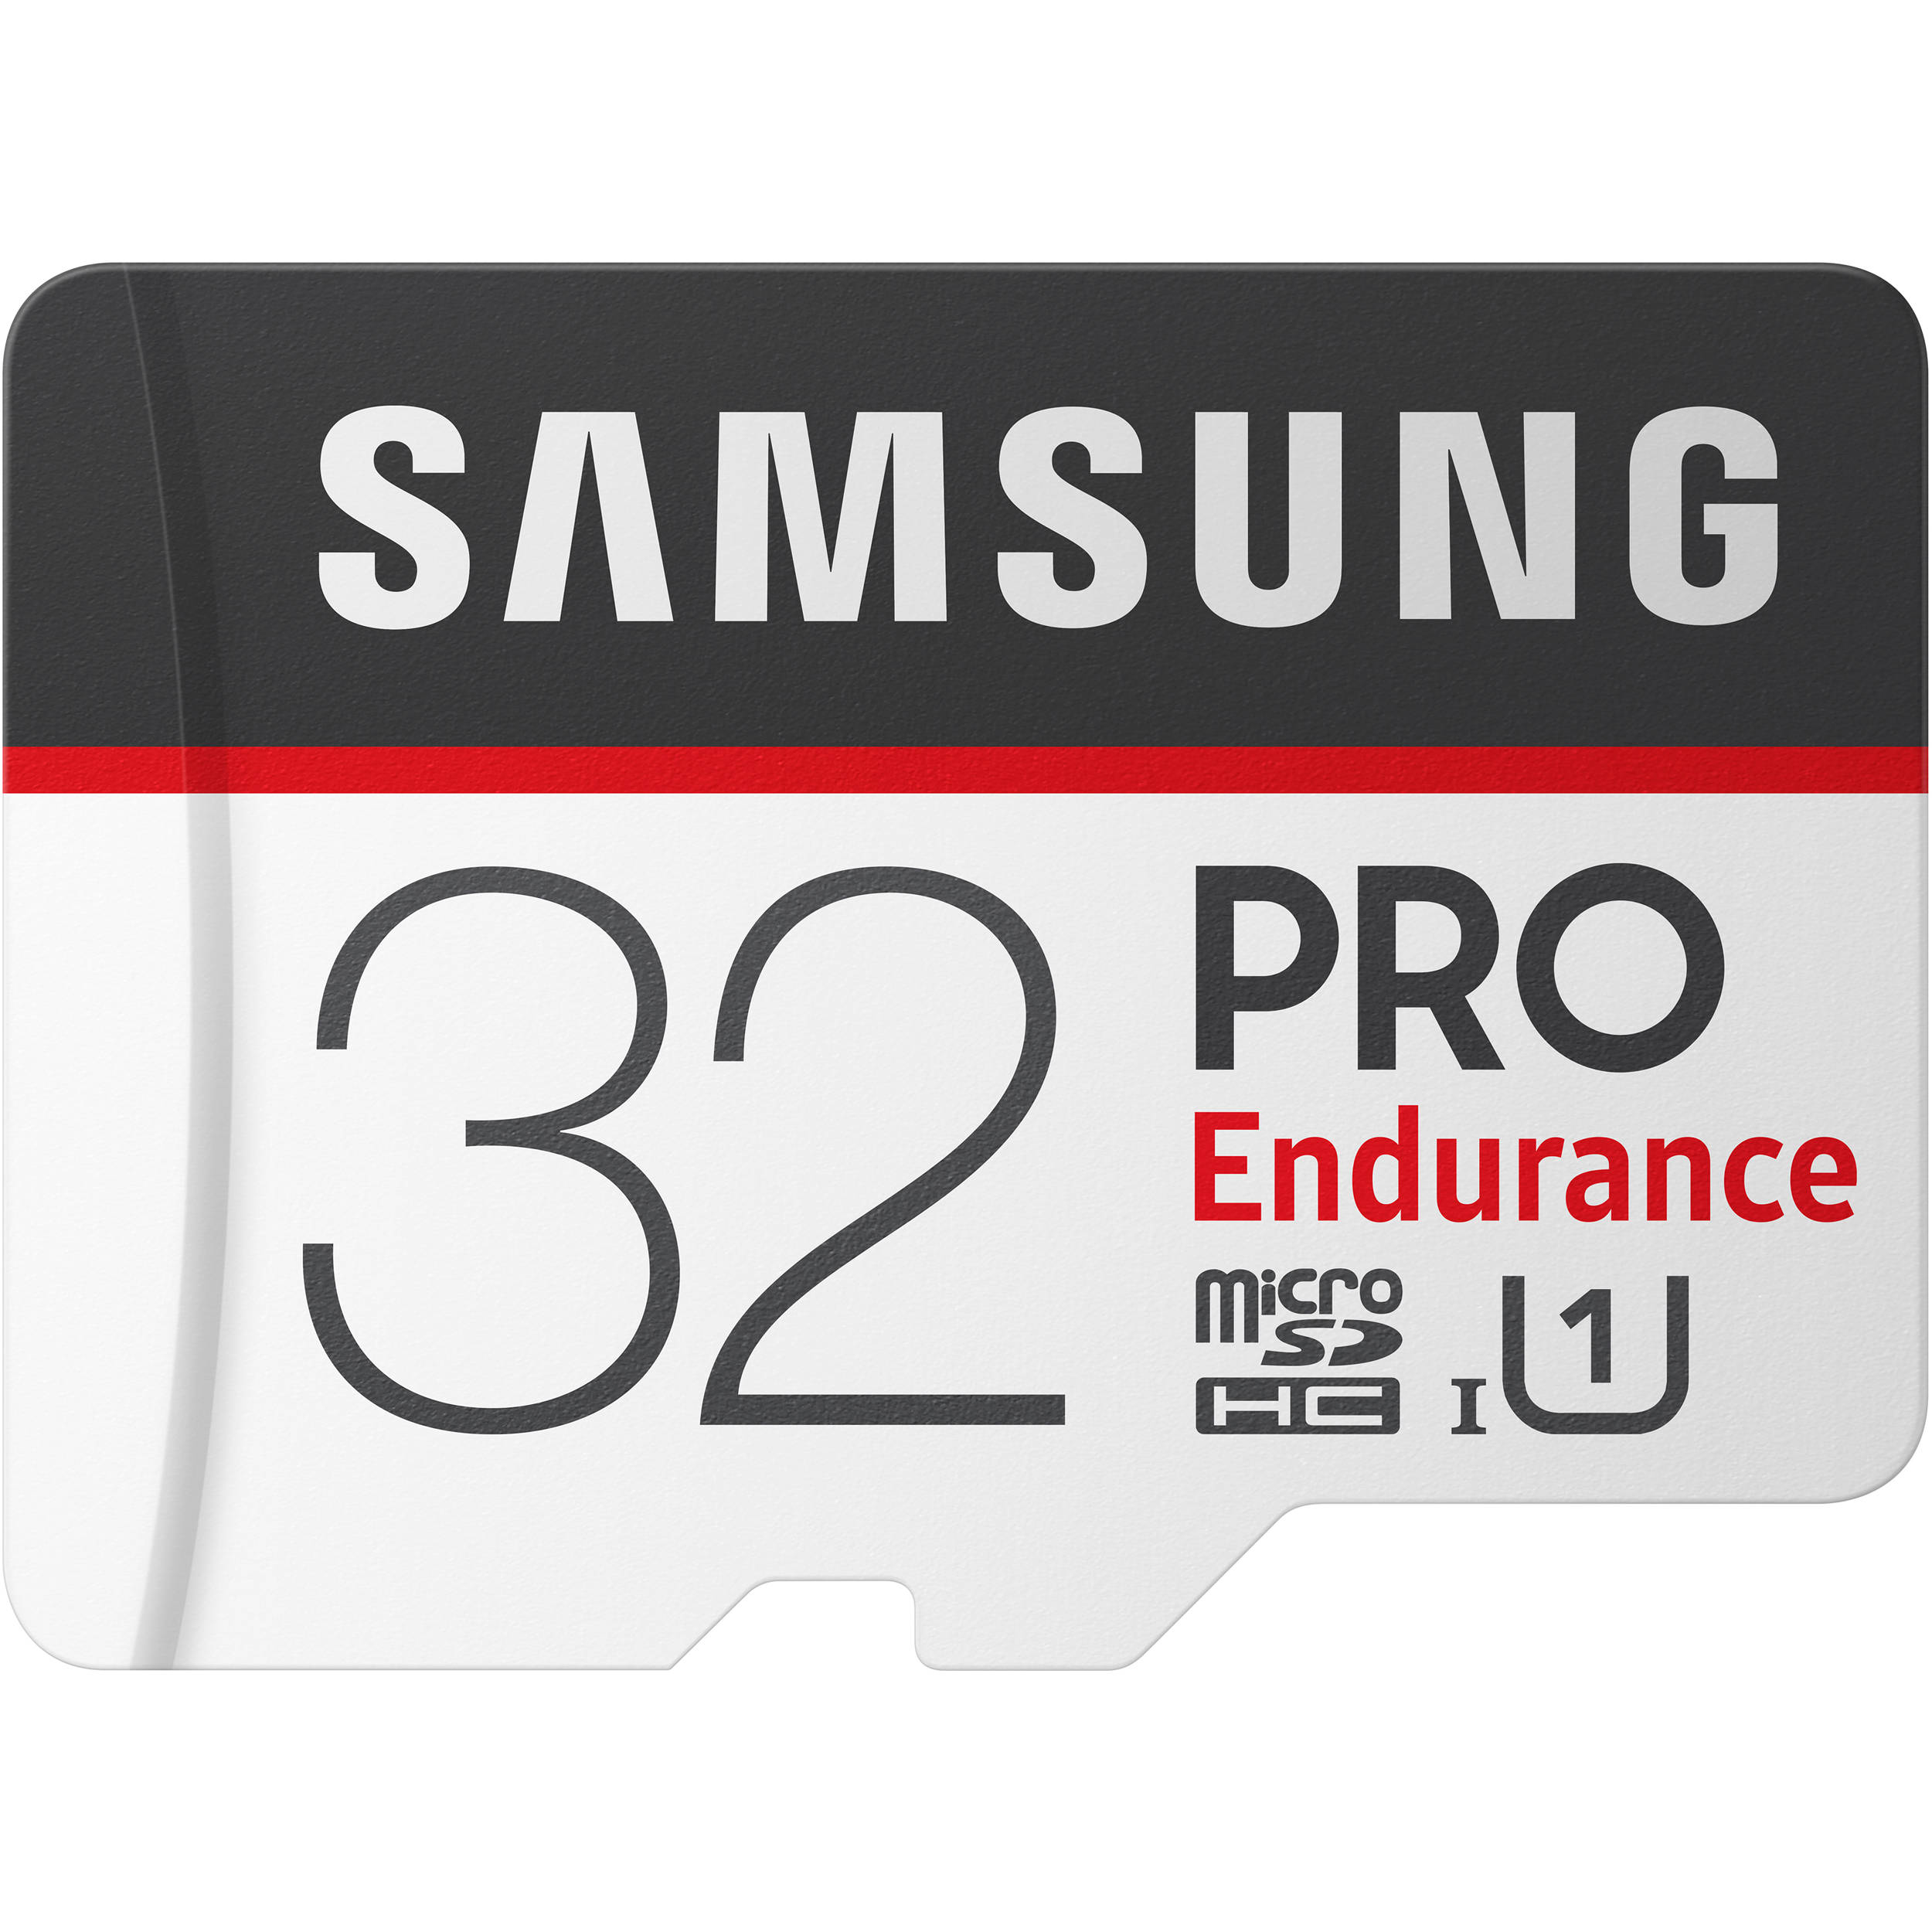 Samsung 32gb Pro Endurance Uhs I Microsdhc Memory Card